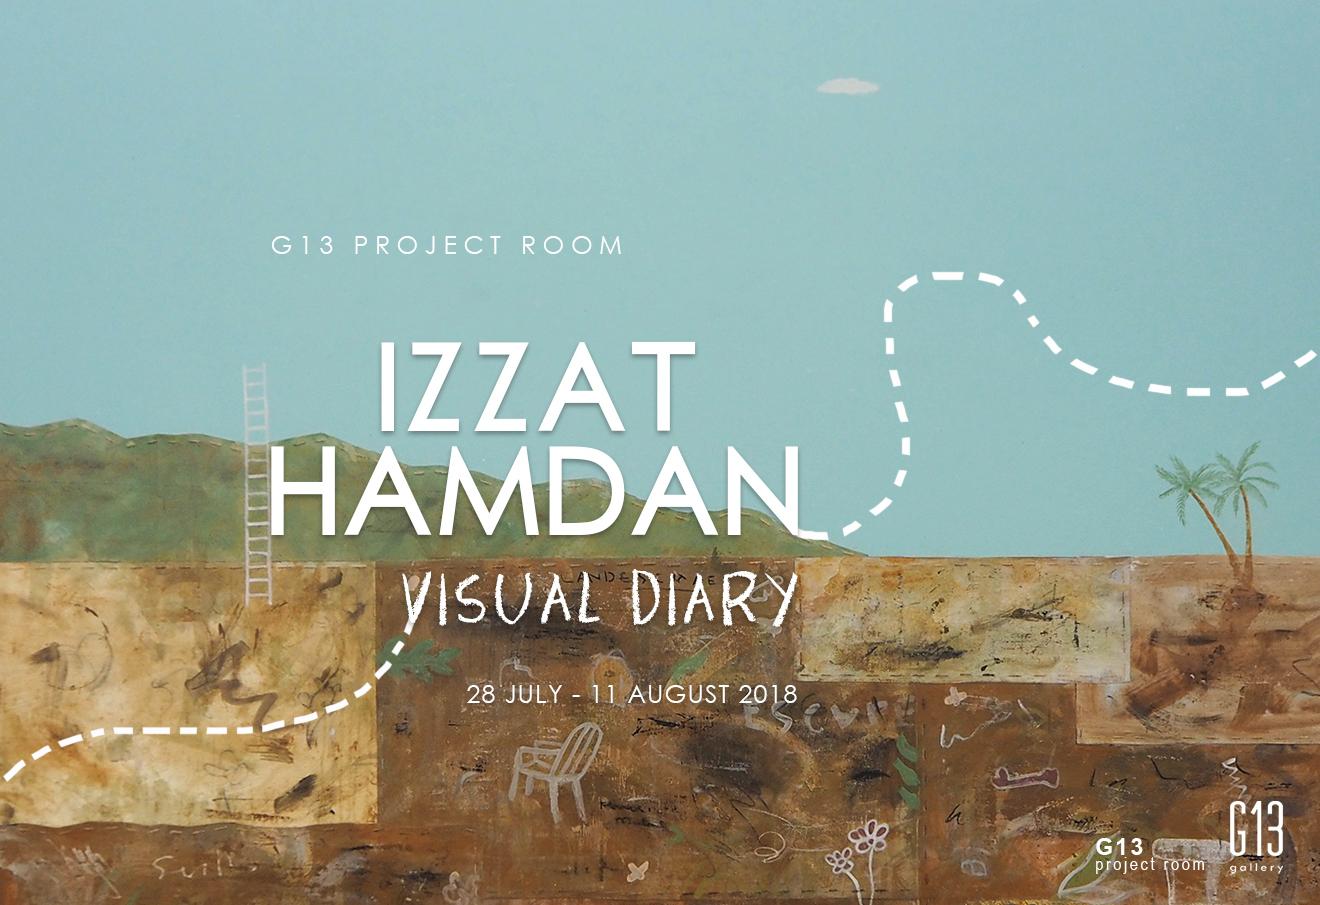 G13 Project Room: Visual Diary by Izzat Hamdan